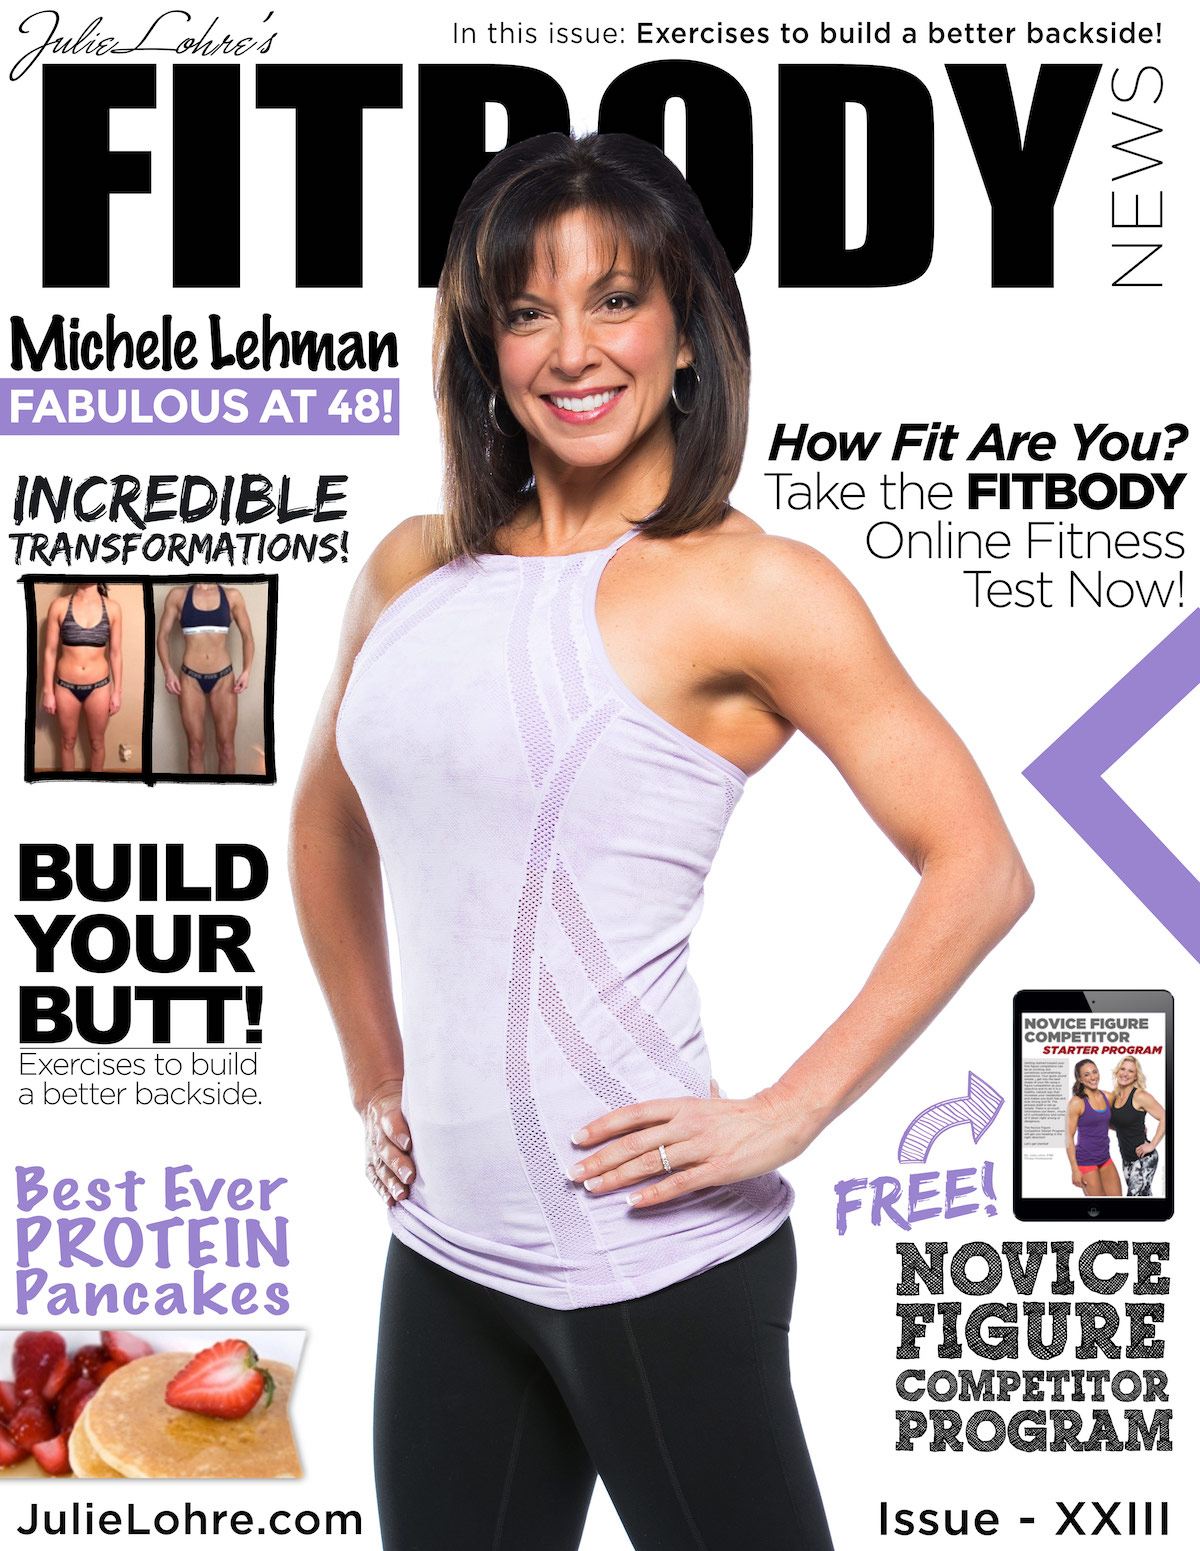 Julie Lohre's Fitbody News Magazine for Women